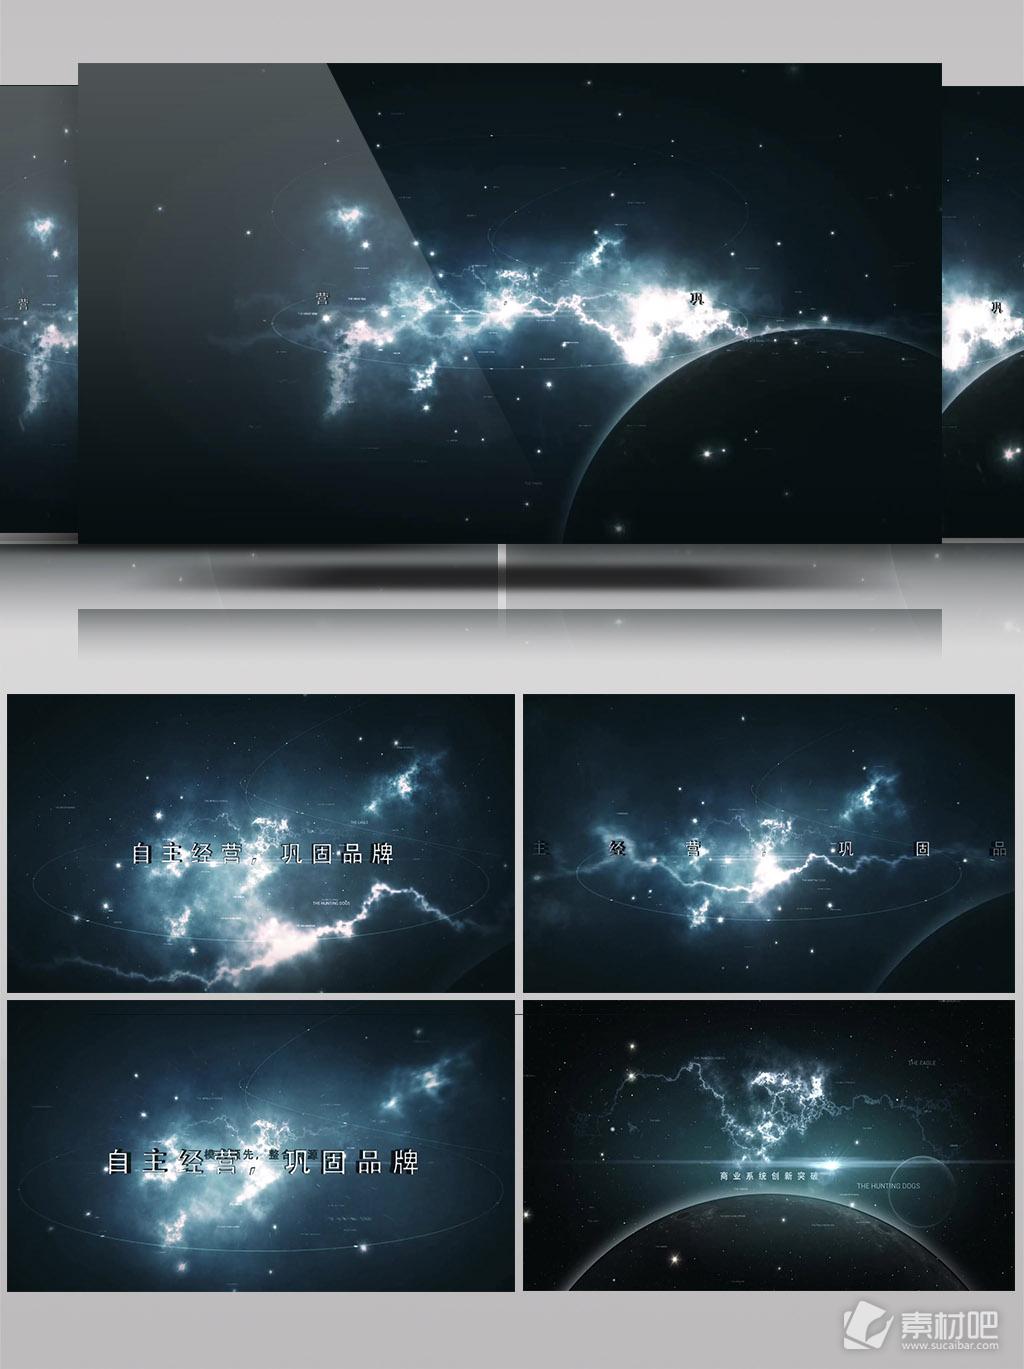 AE星空震撼片头展示